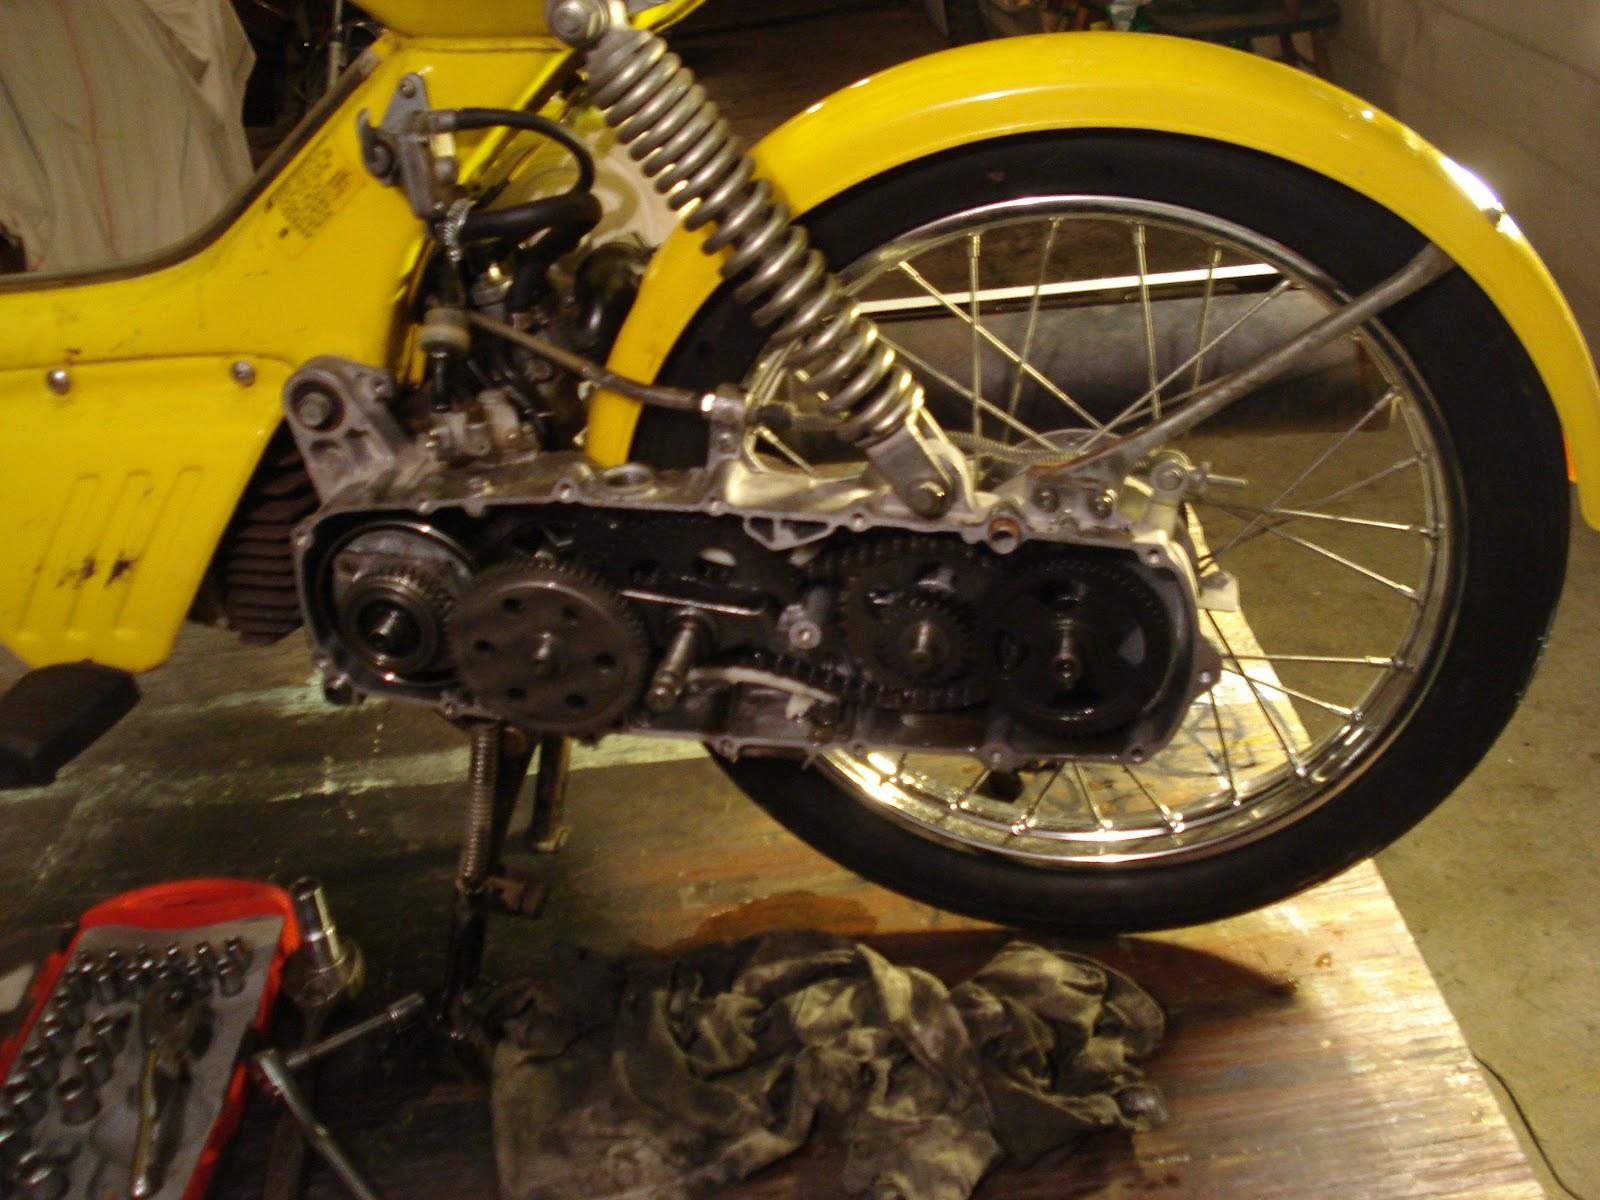 Restored Motorcycle Style  June 2012